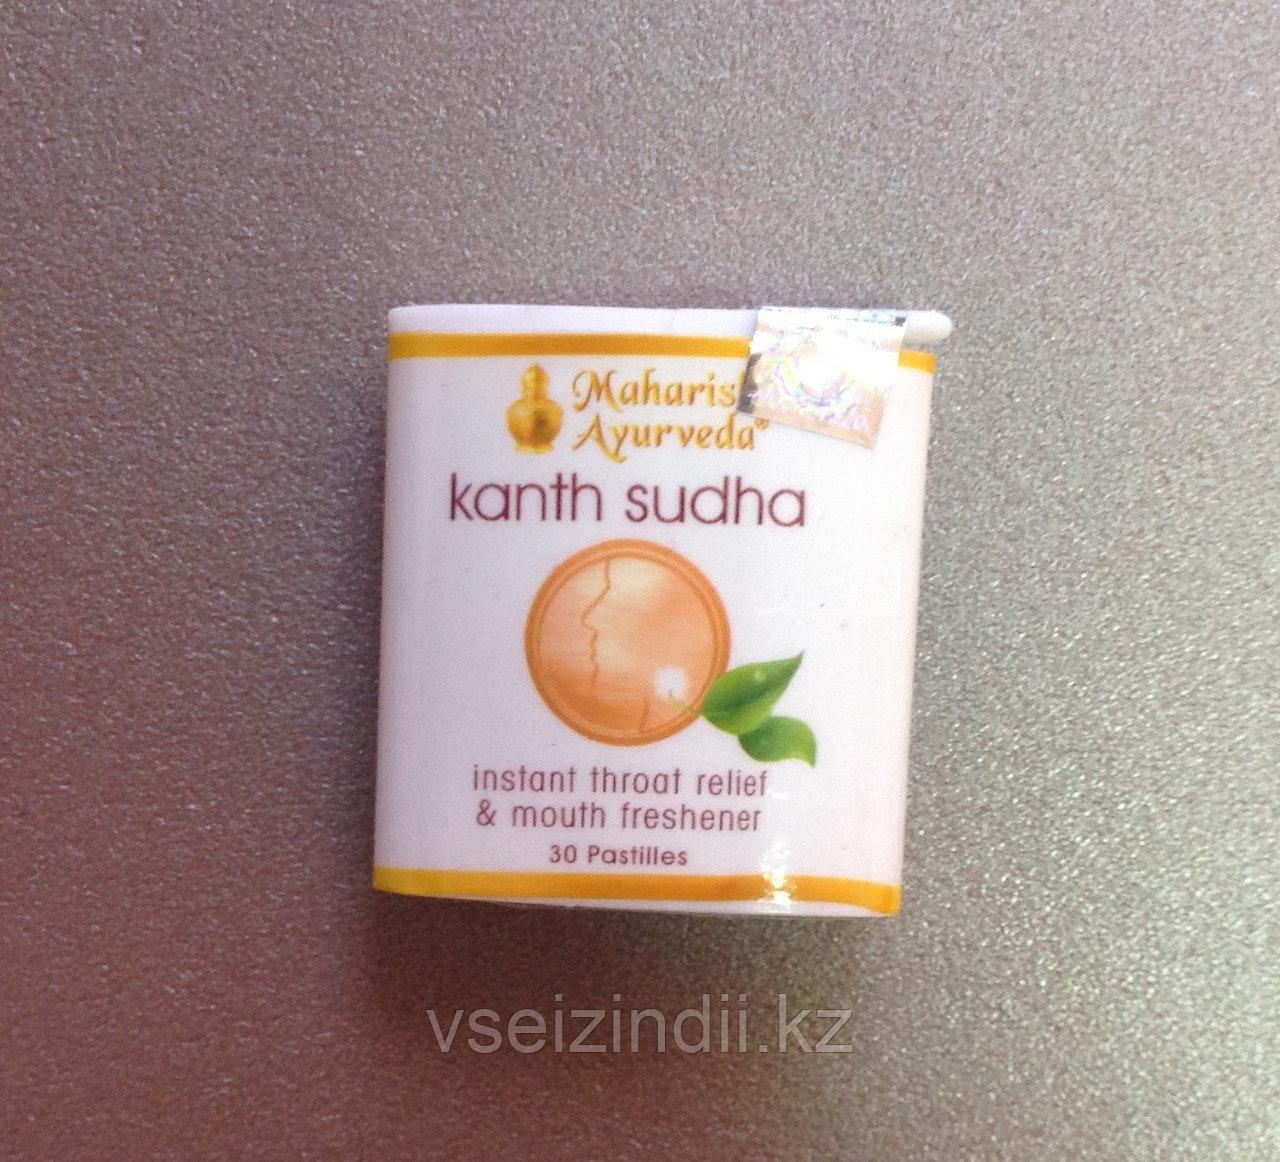 Кантх судха освежитель полости рта, антисептик -30табл